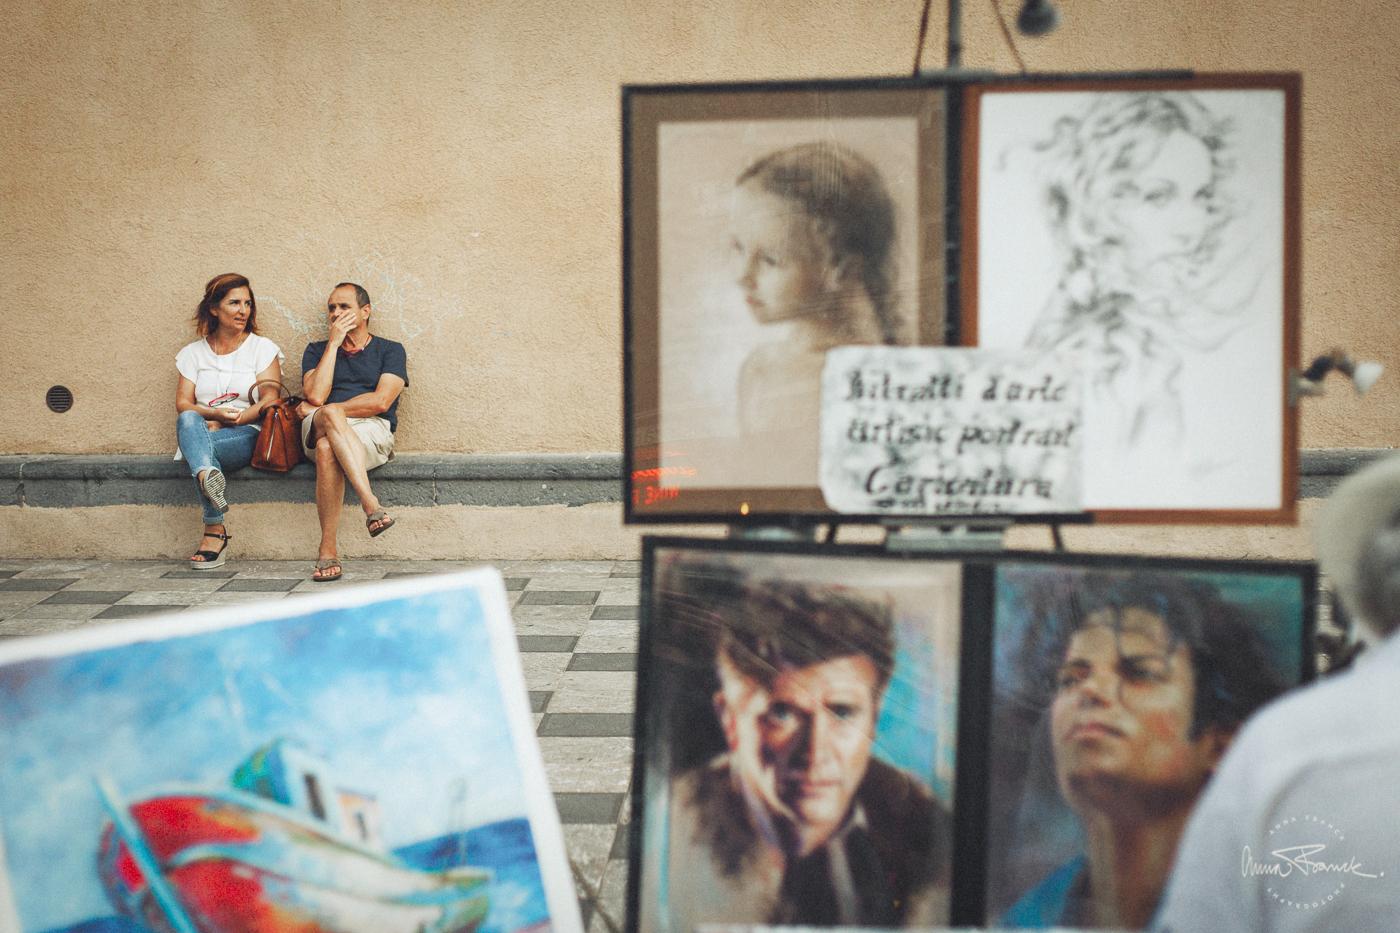 anna, franck, photography, sicilia, sicily, taormina, travelphotography, lifestyle, urban, architecture, details, moments, dogs, summer, stockholm, photographer